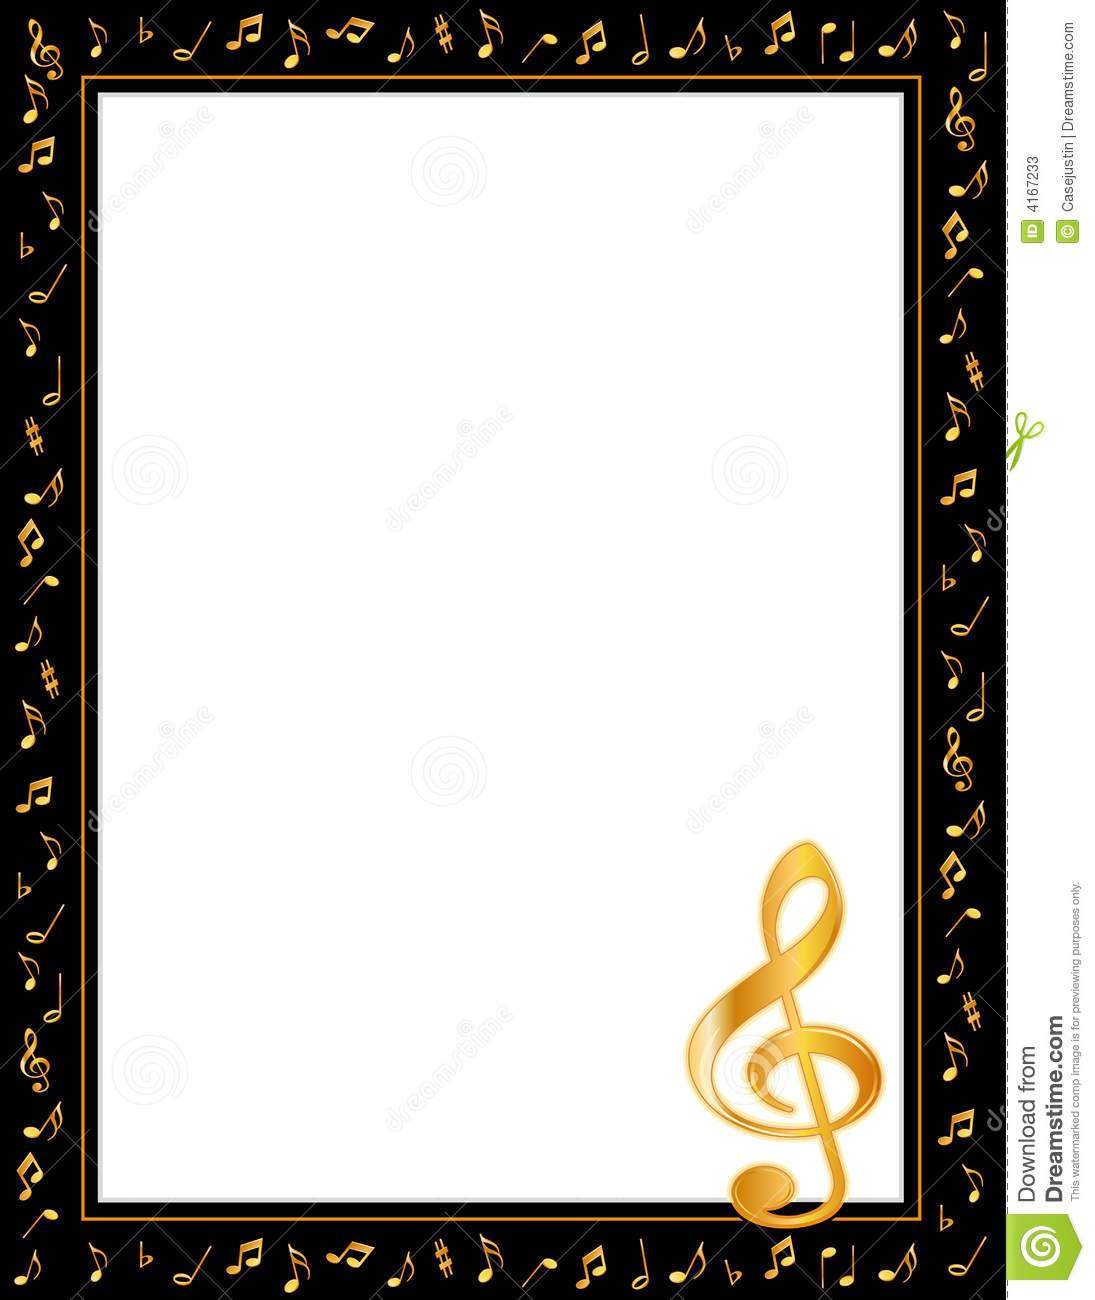 1095x1300 Christmas Music Notes Border Clipart Panda